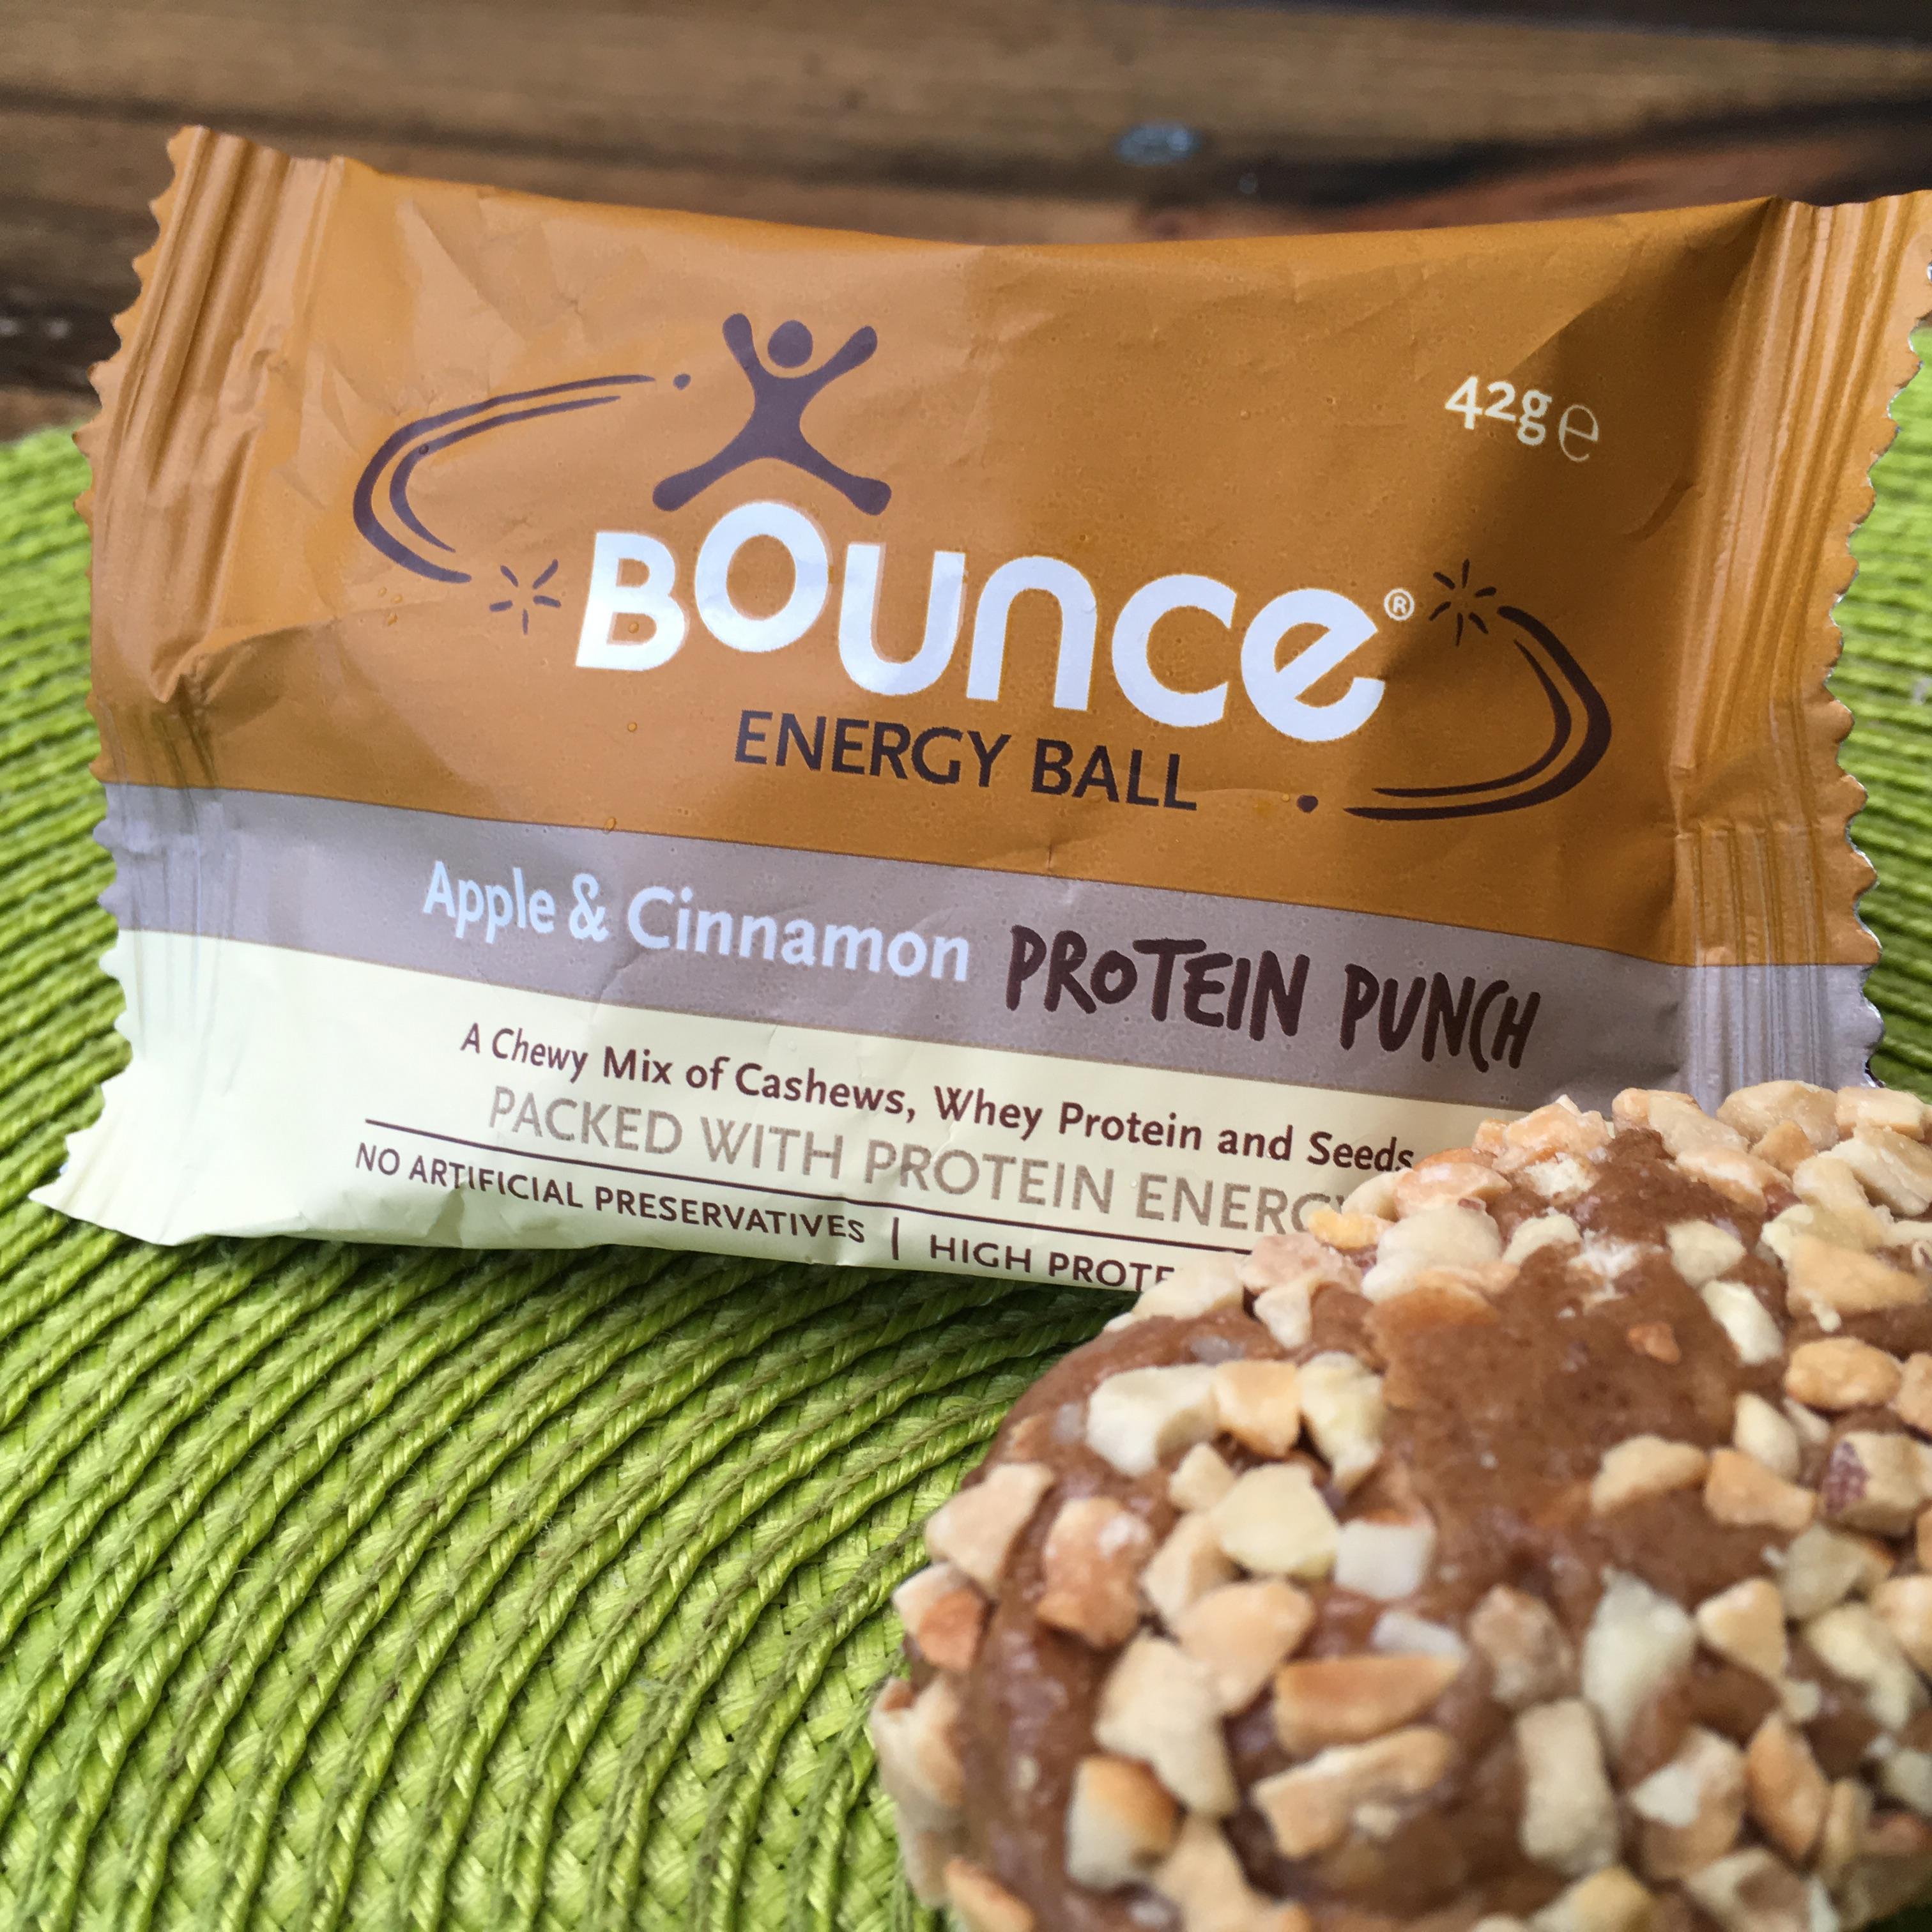 bolas proteicas, bolas proteicas de coco, bola proteica, bola de proteína